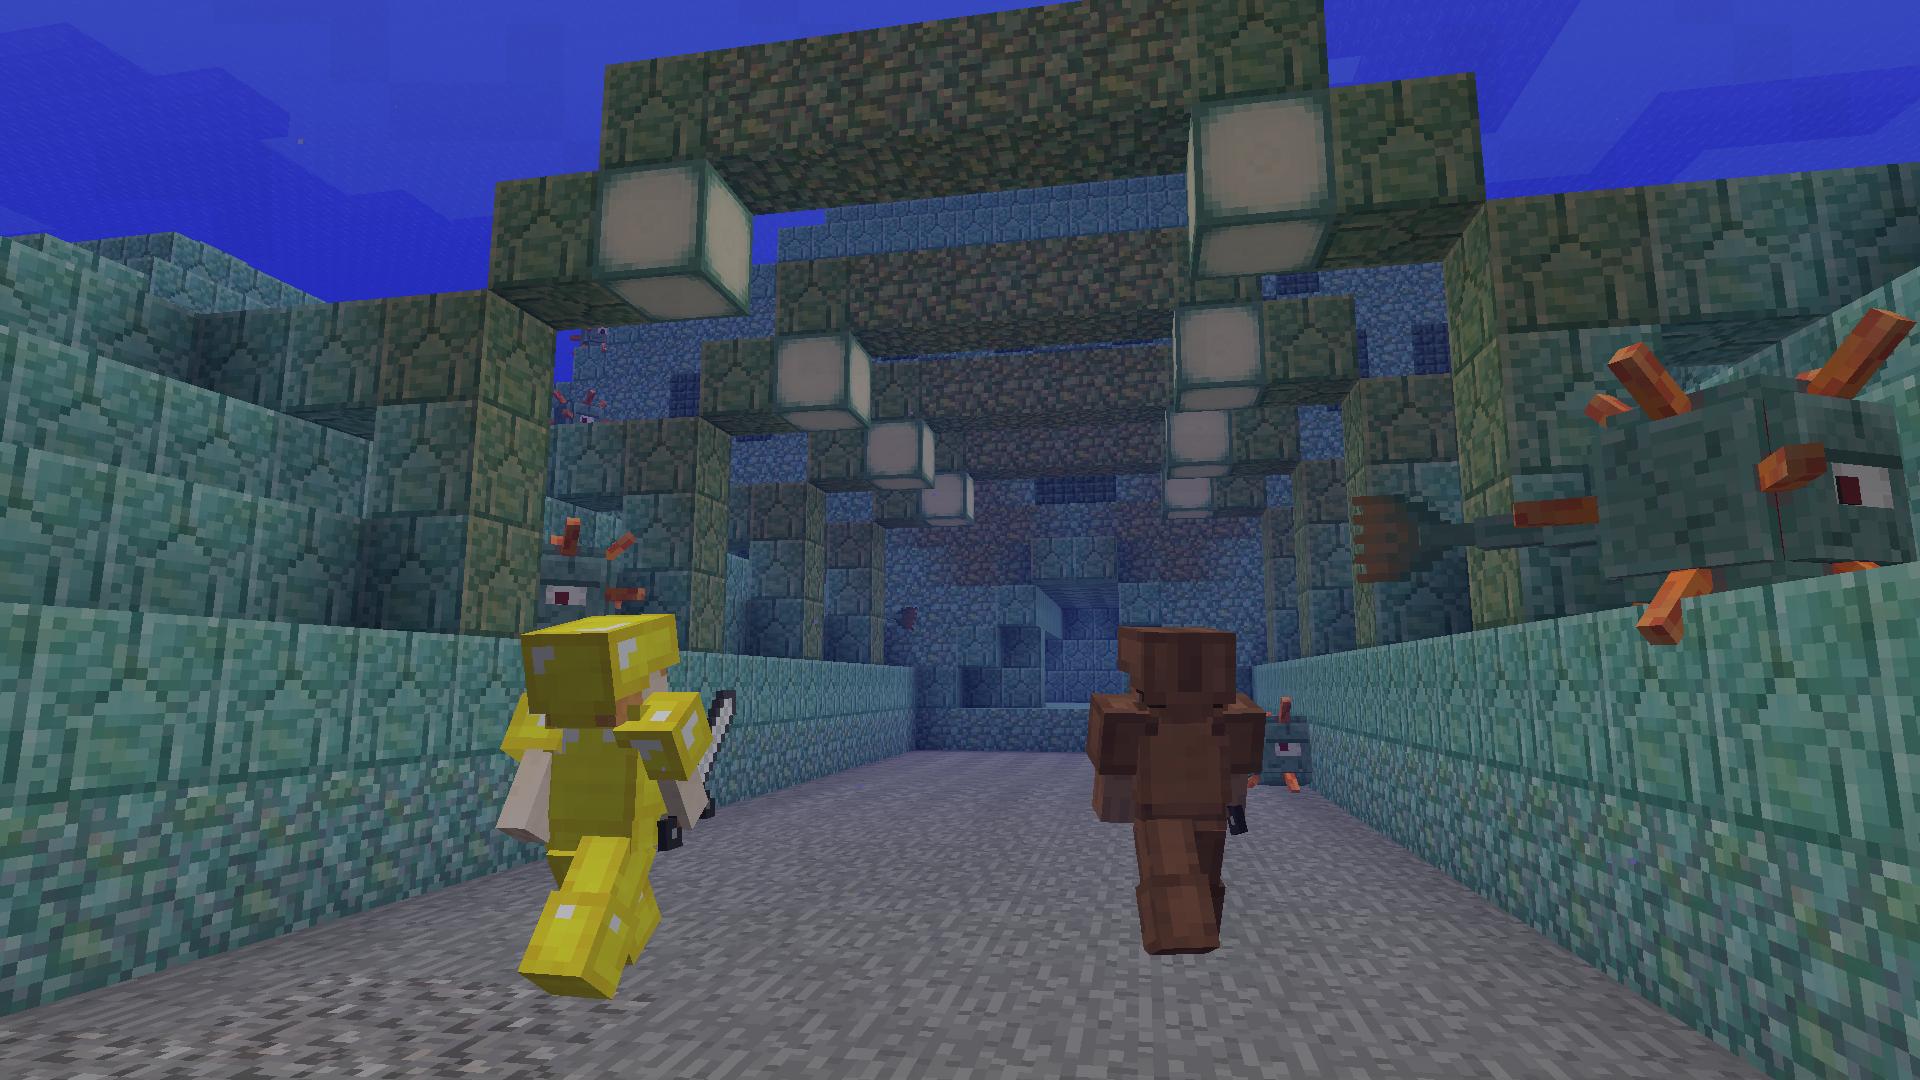 Minecraft_1.8.8_Biome_OceanMonument